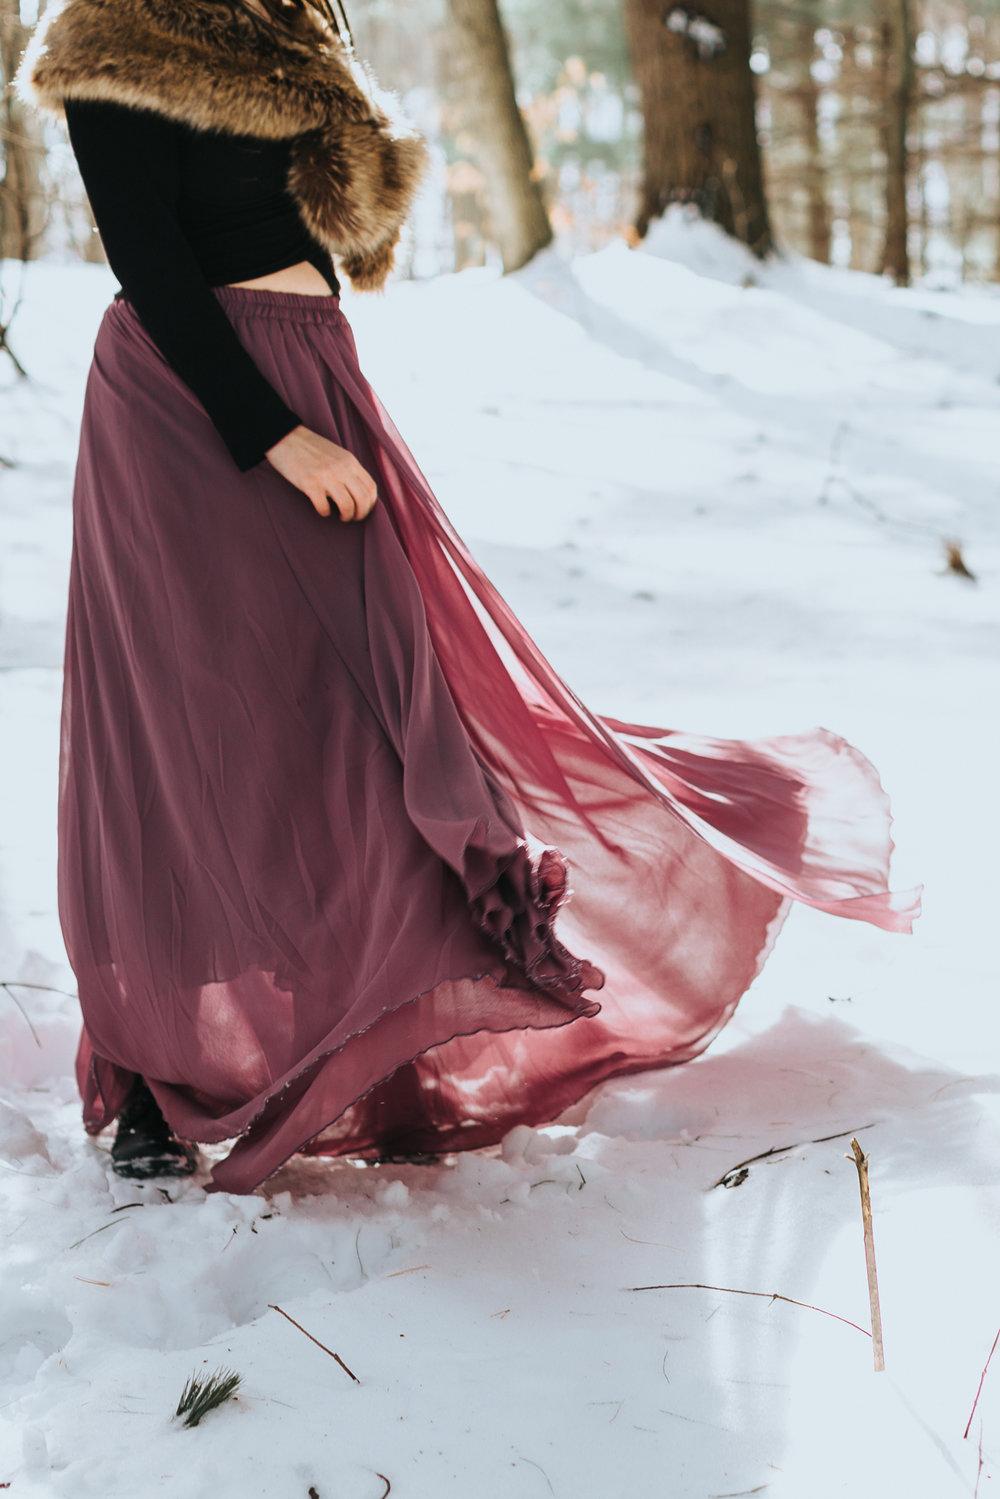 sun-dress-winter-portrait-at-bangors-columcille-megalith-park